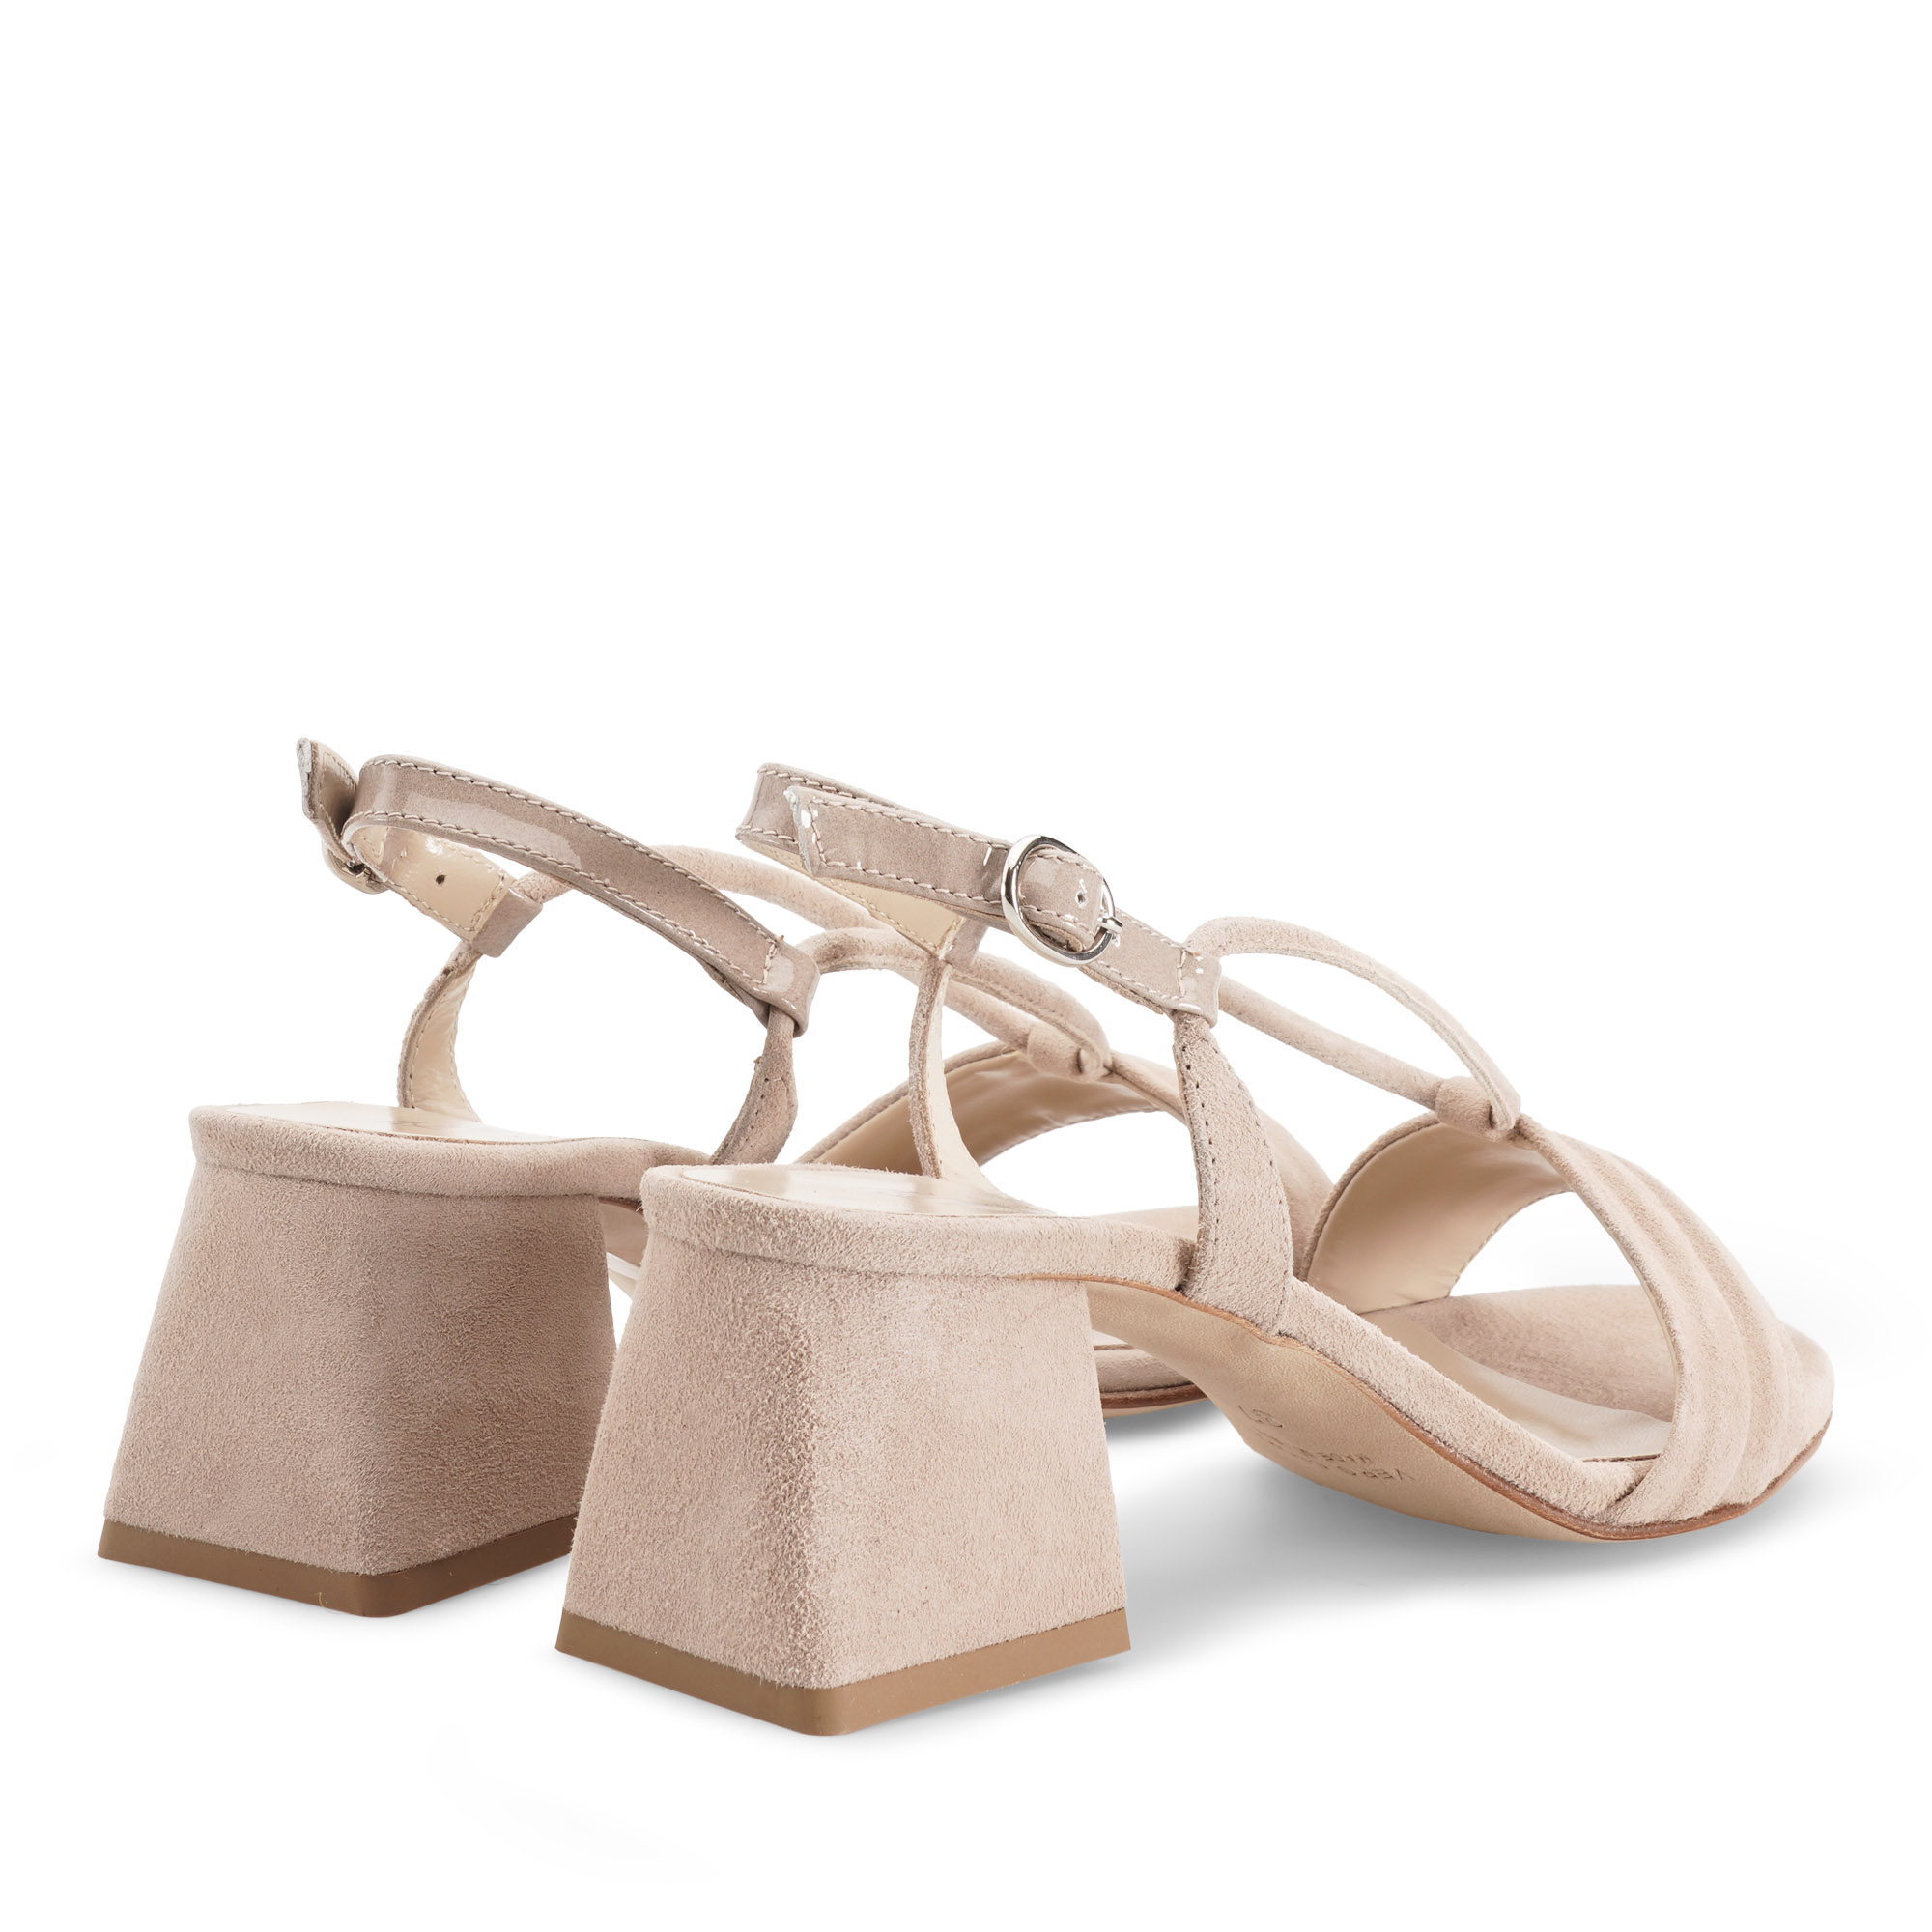 sandalo-donna-camoscio-beige-emanuela-passeri-shoes-heels-spring-summer-2021